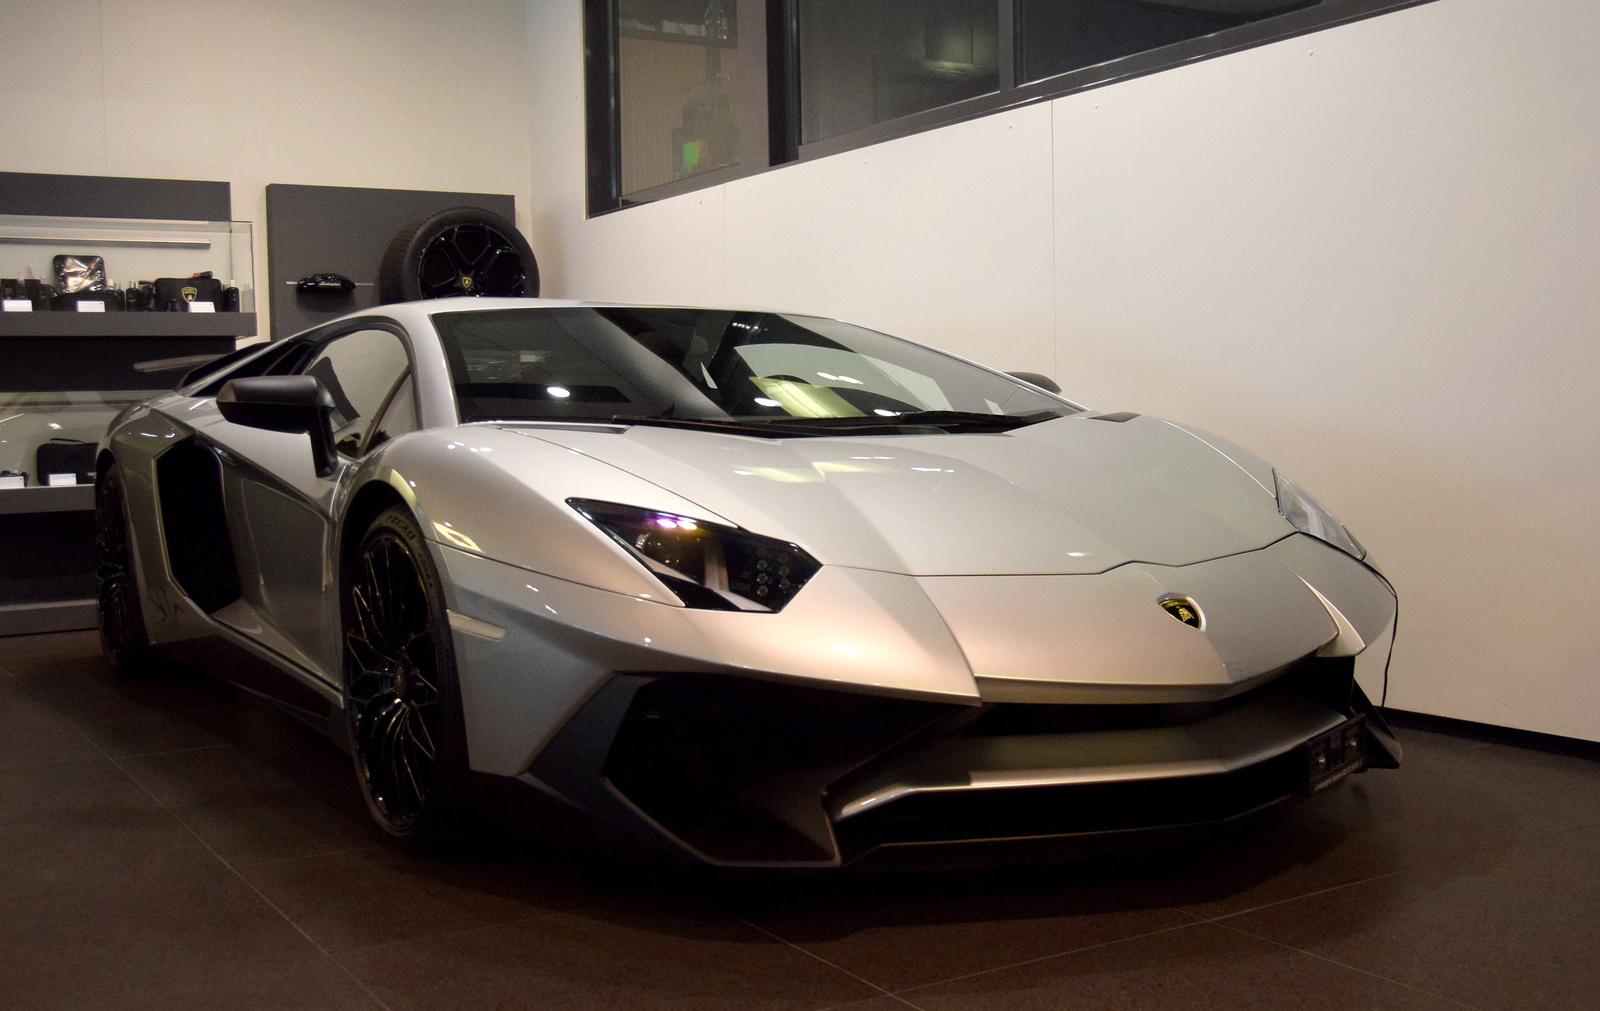 Lamborghini Avantador LP750-4 Super Veloce